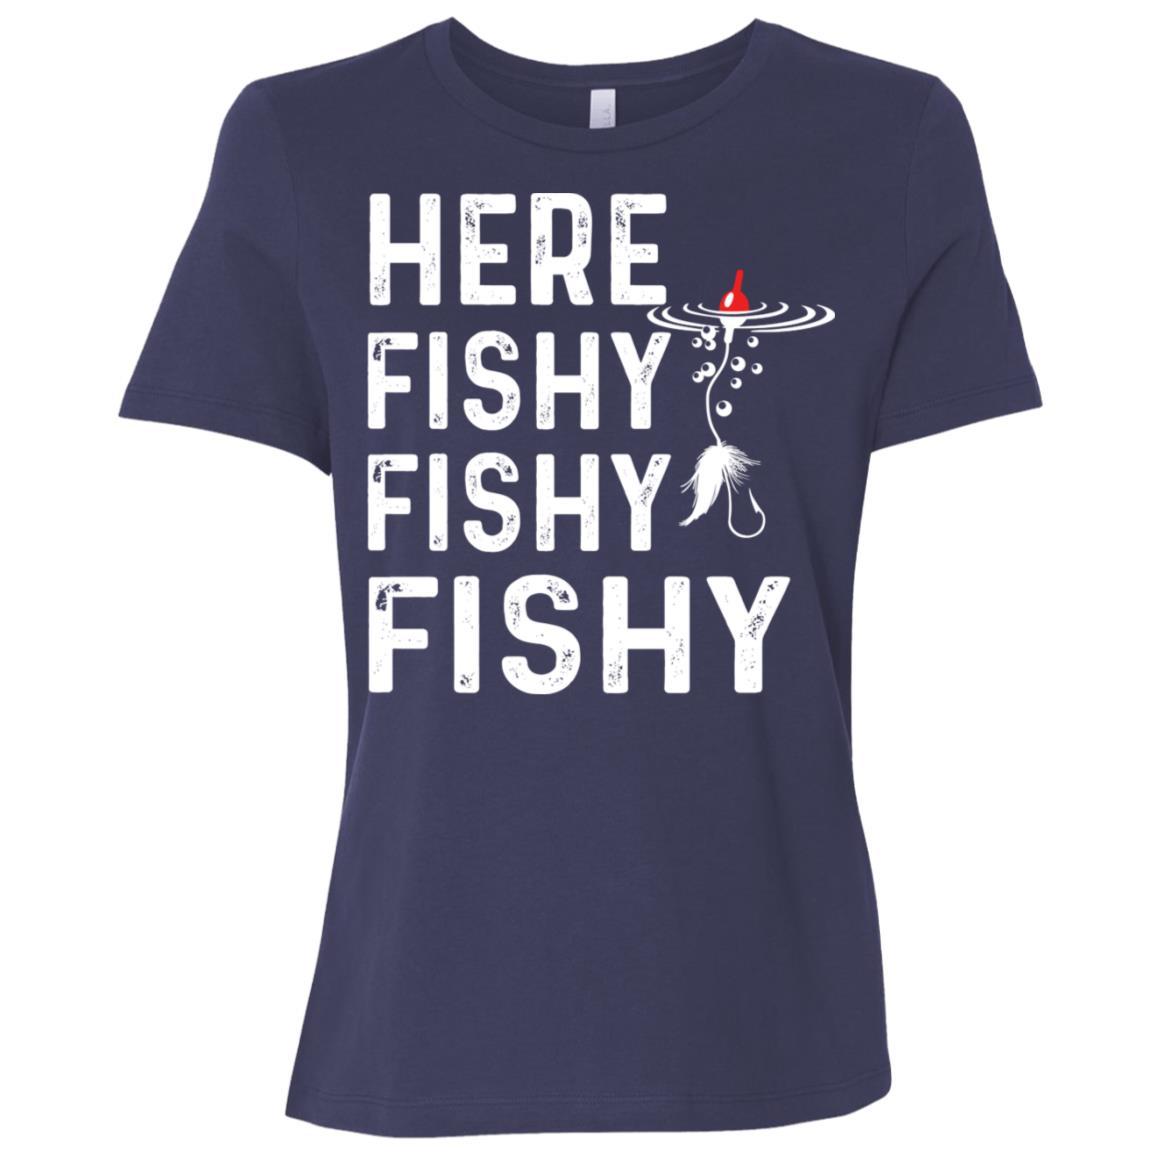 Here Fishy Fishy Fishy Funny Fisherman Tee Women Short Sleeve T-Shirt